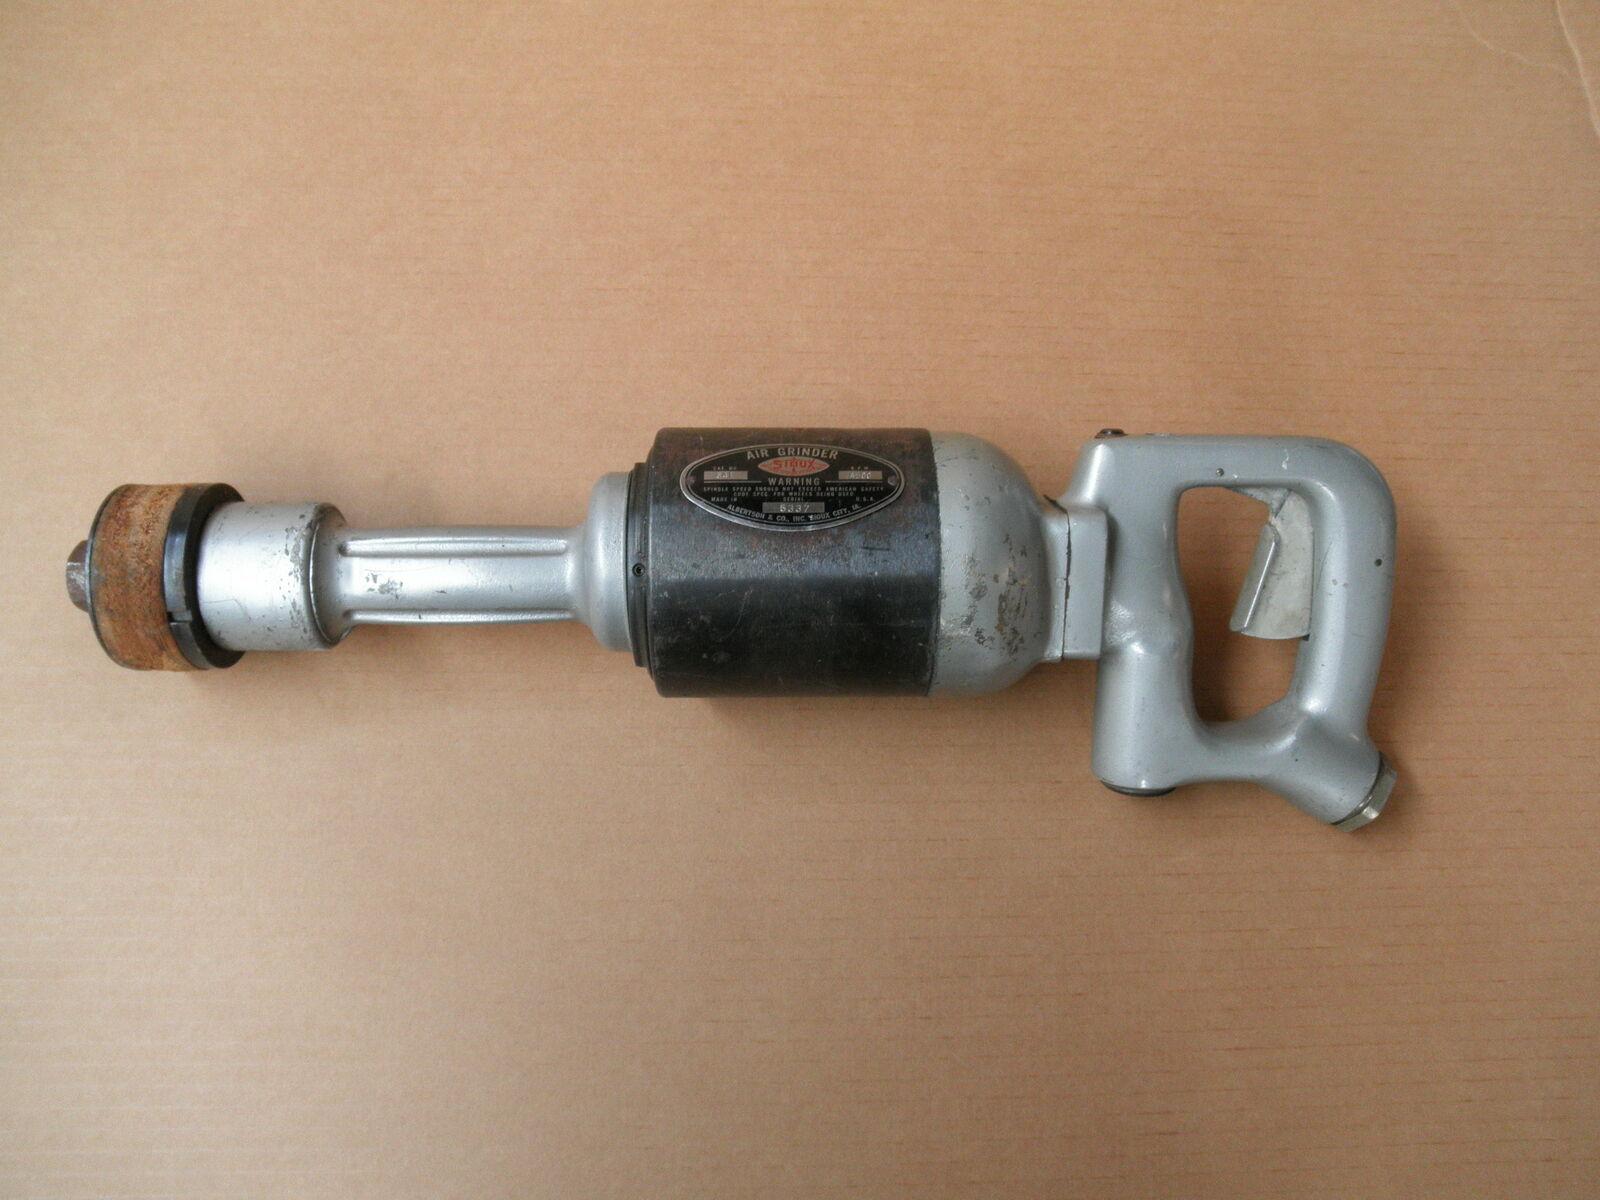 Sioux 541 Pneumatic Air Grinder polisher sander 5 8  4500 RPM